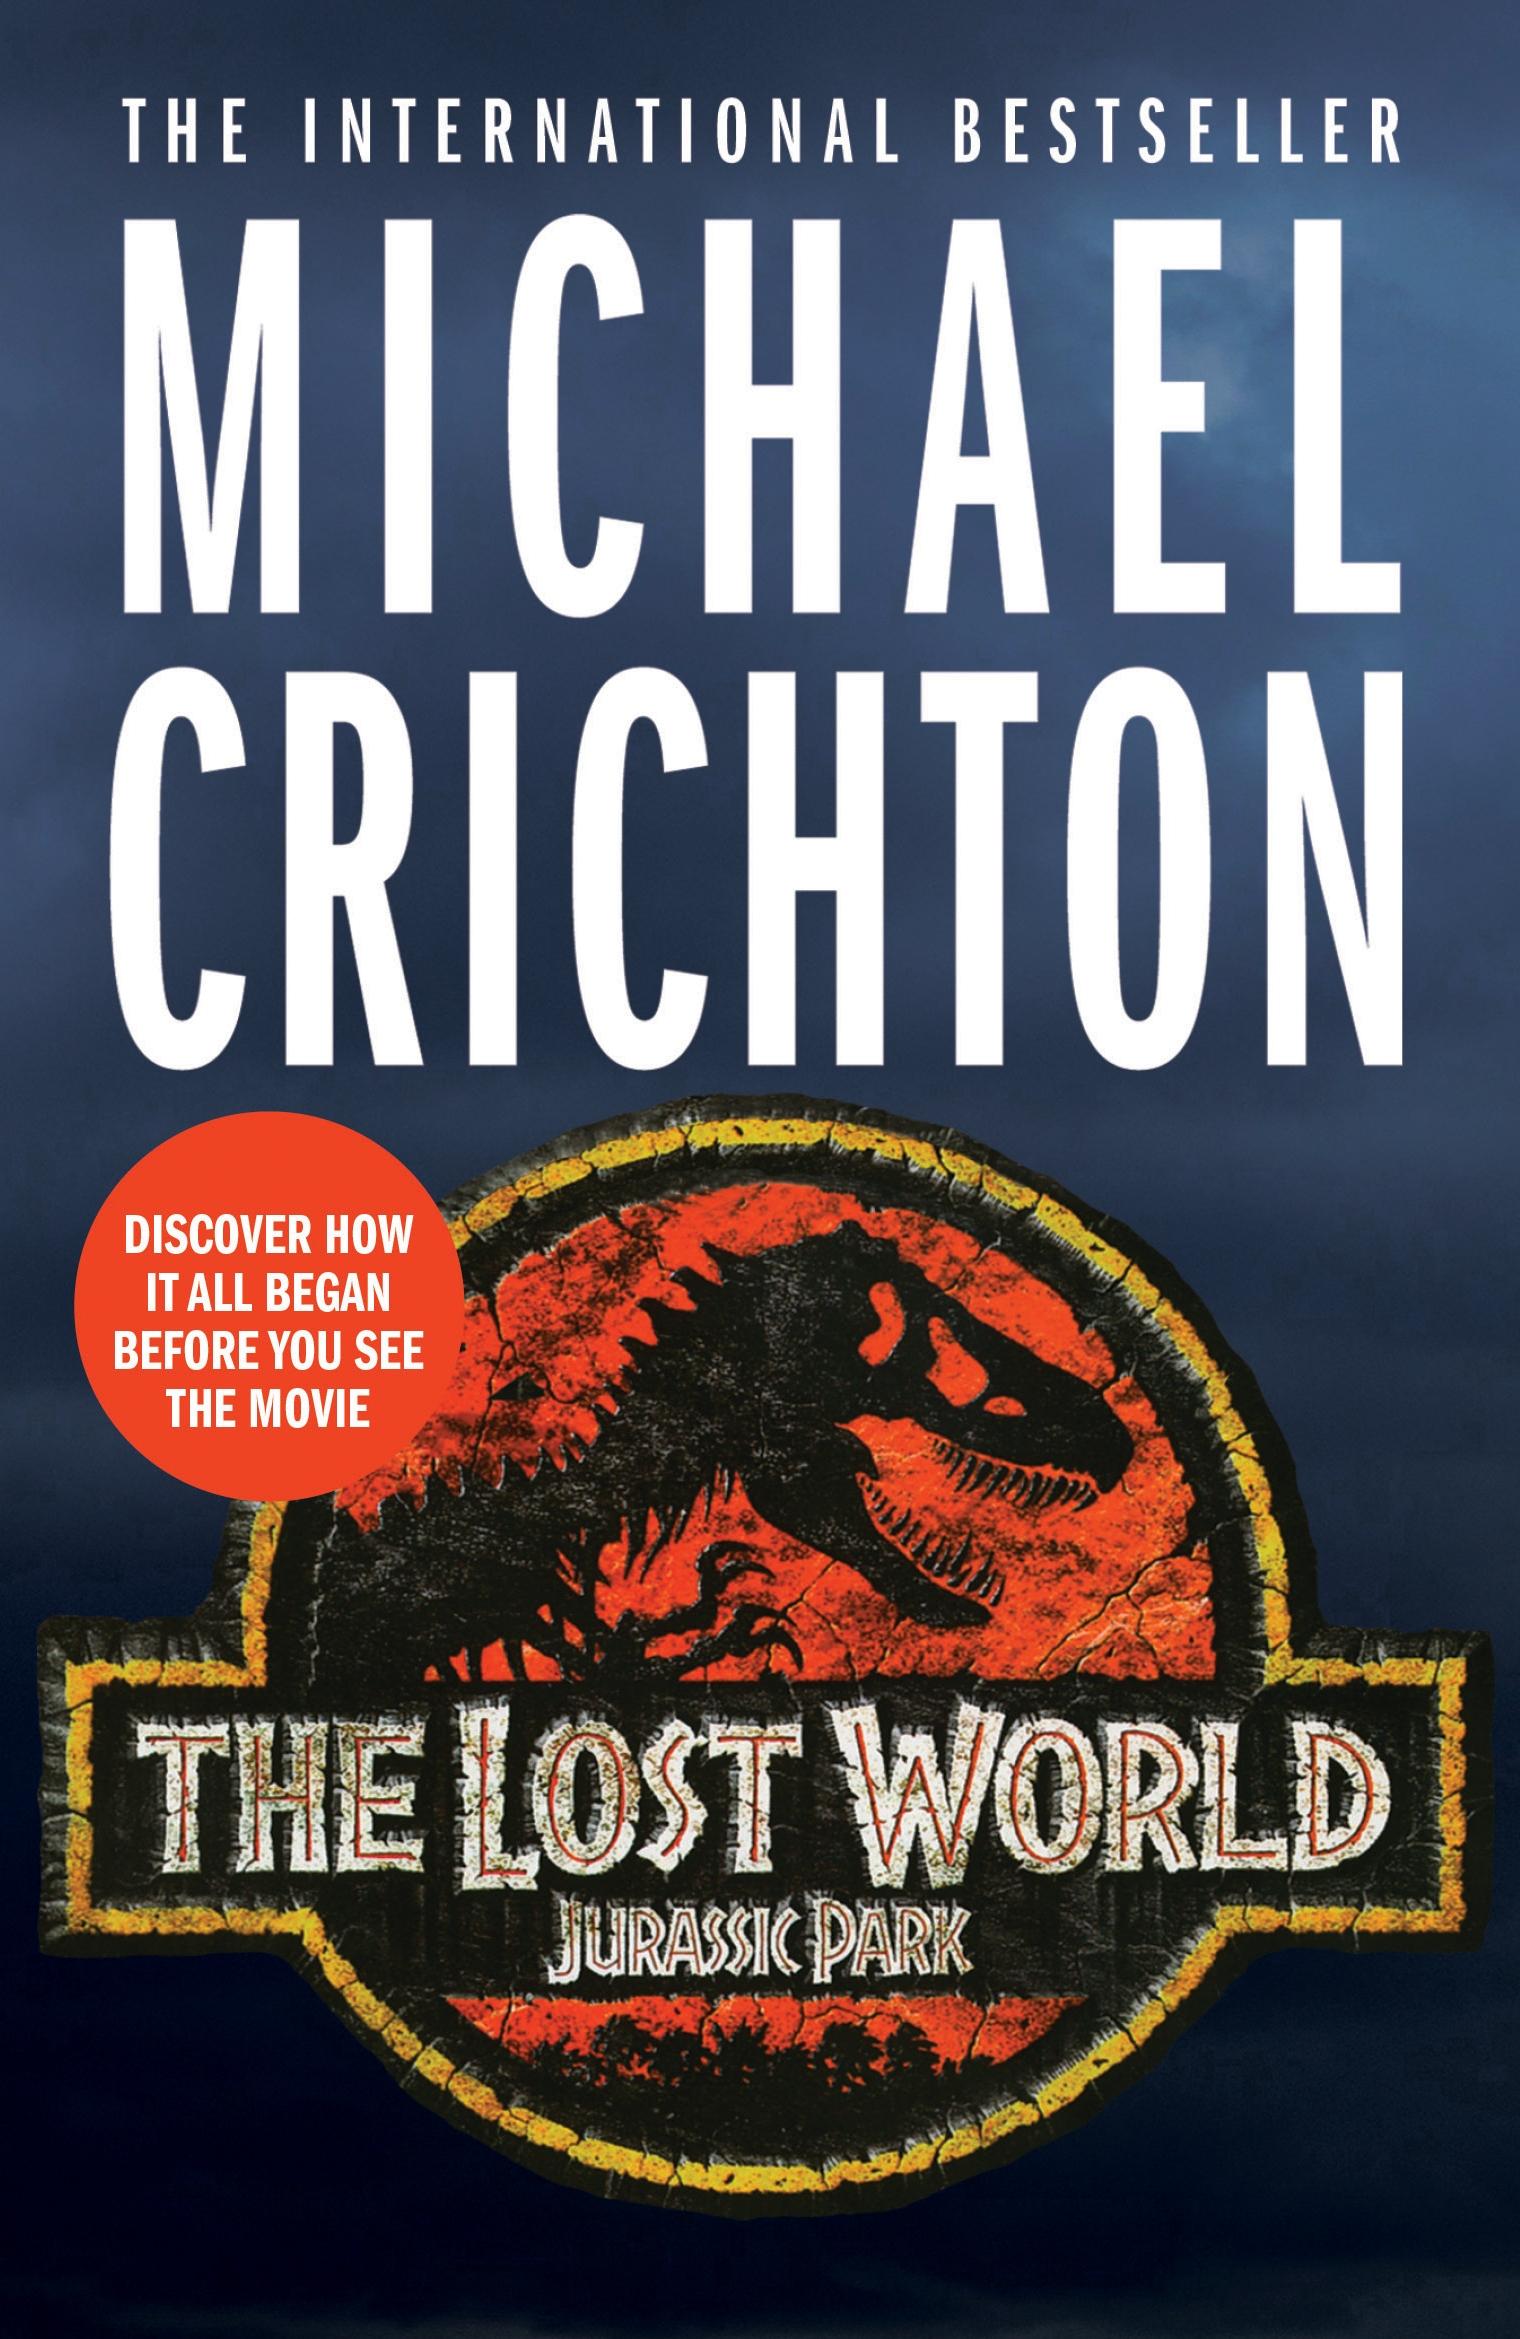 Michael Crichton medical school